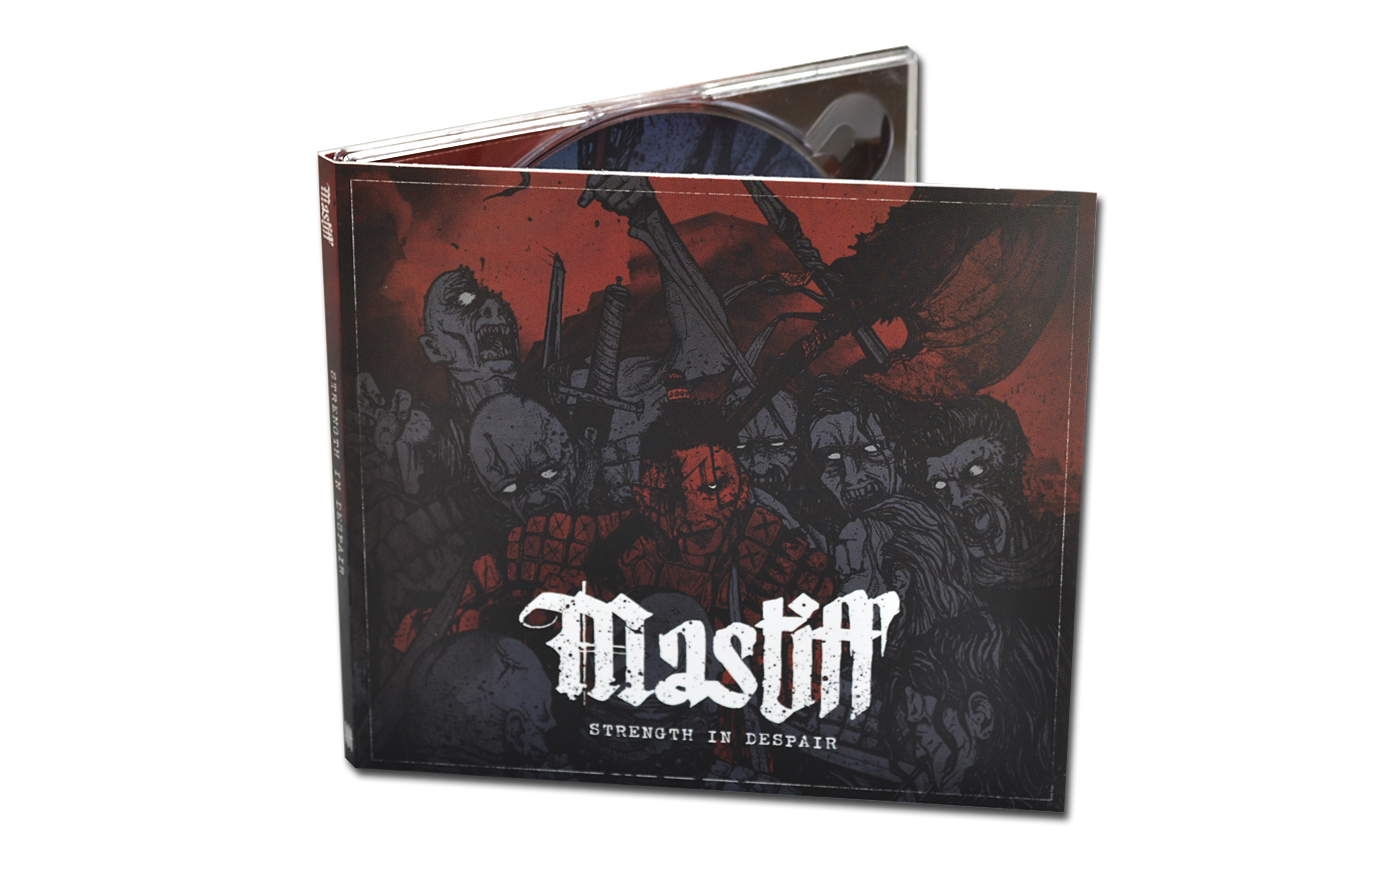 MASTIFF 'Strength In Despair' front